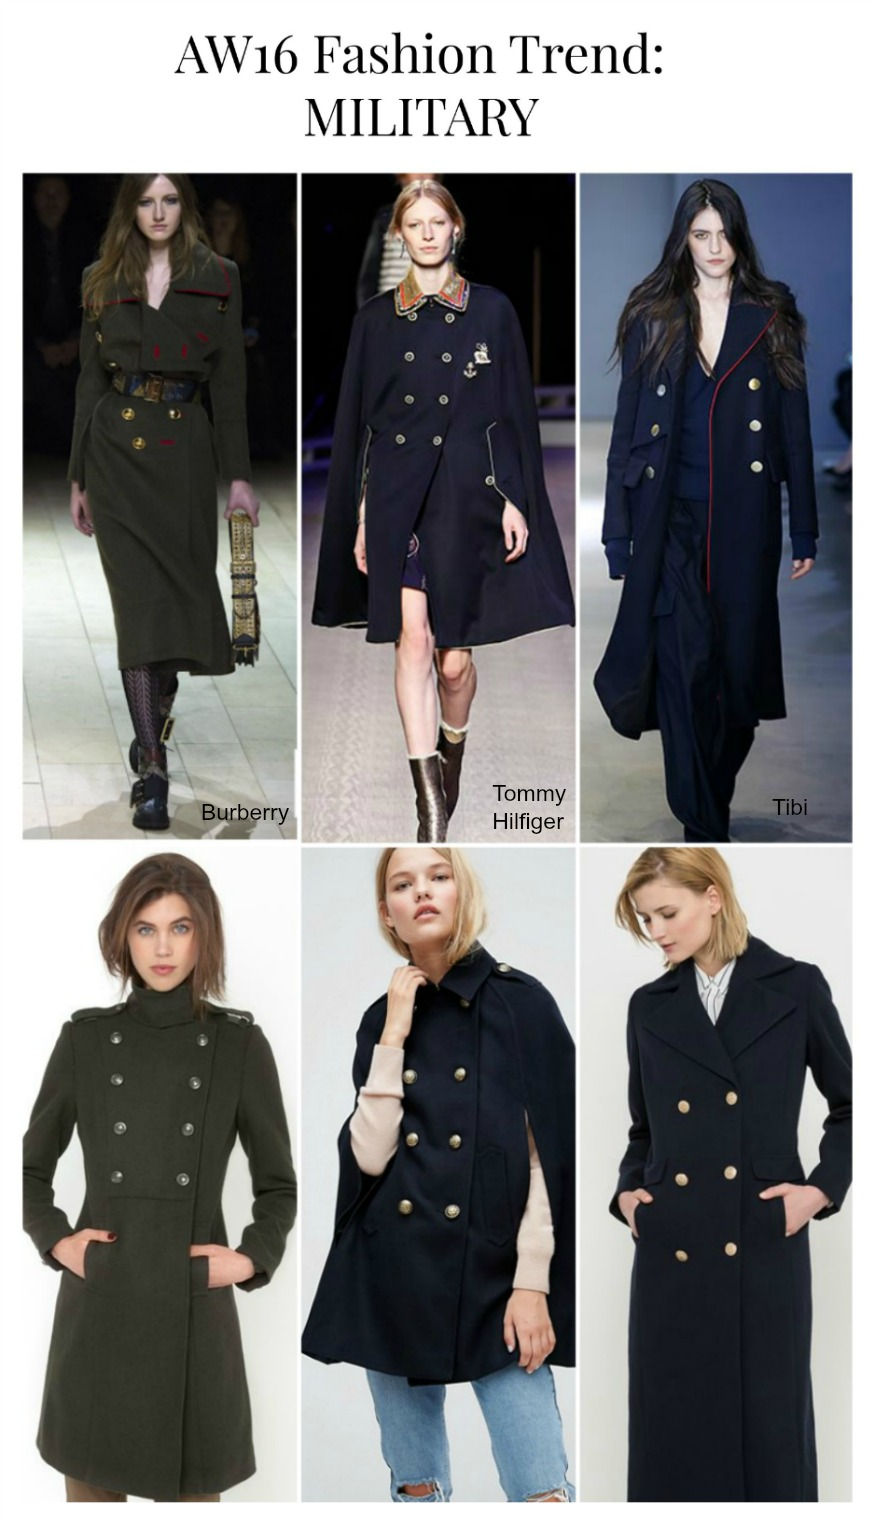 AW16 Fashion Trend Military